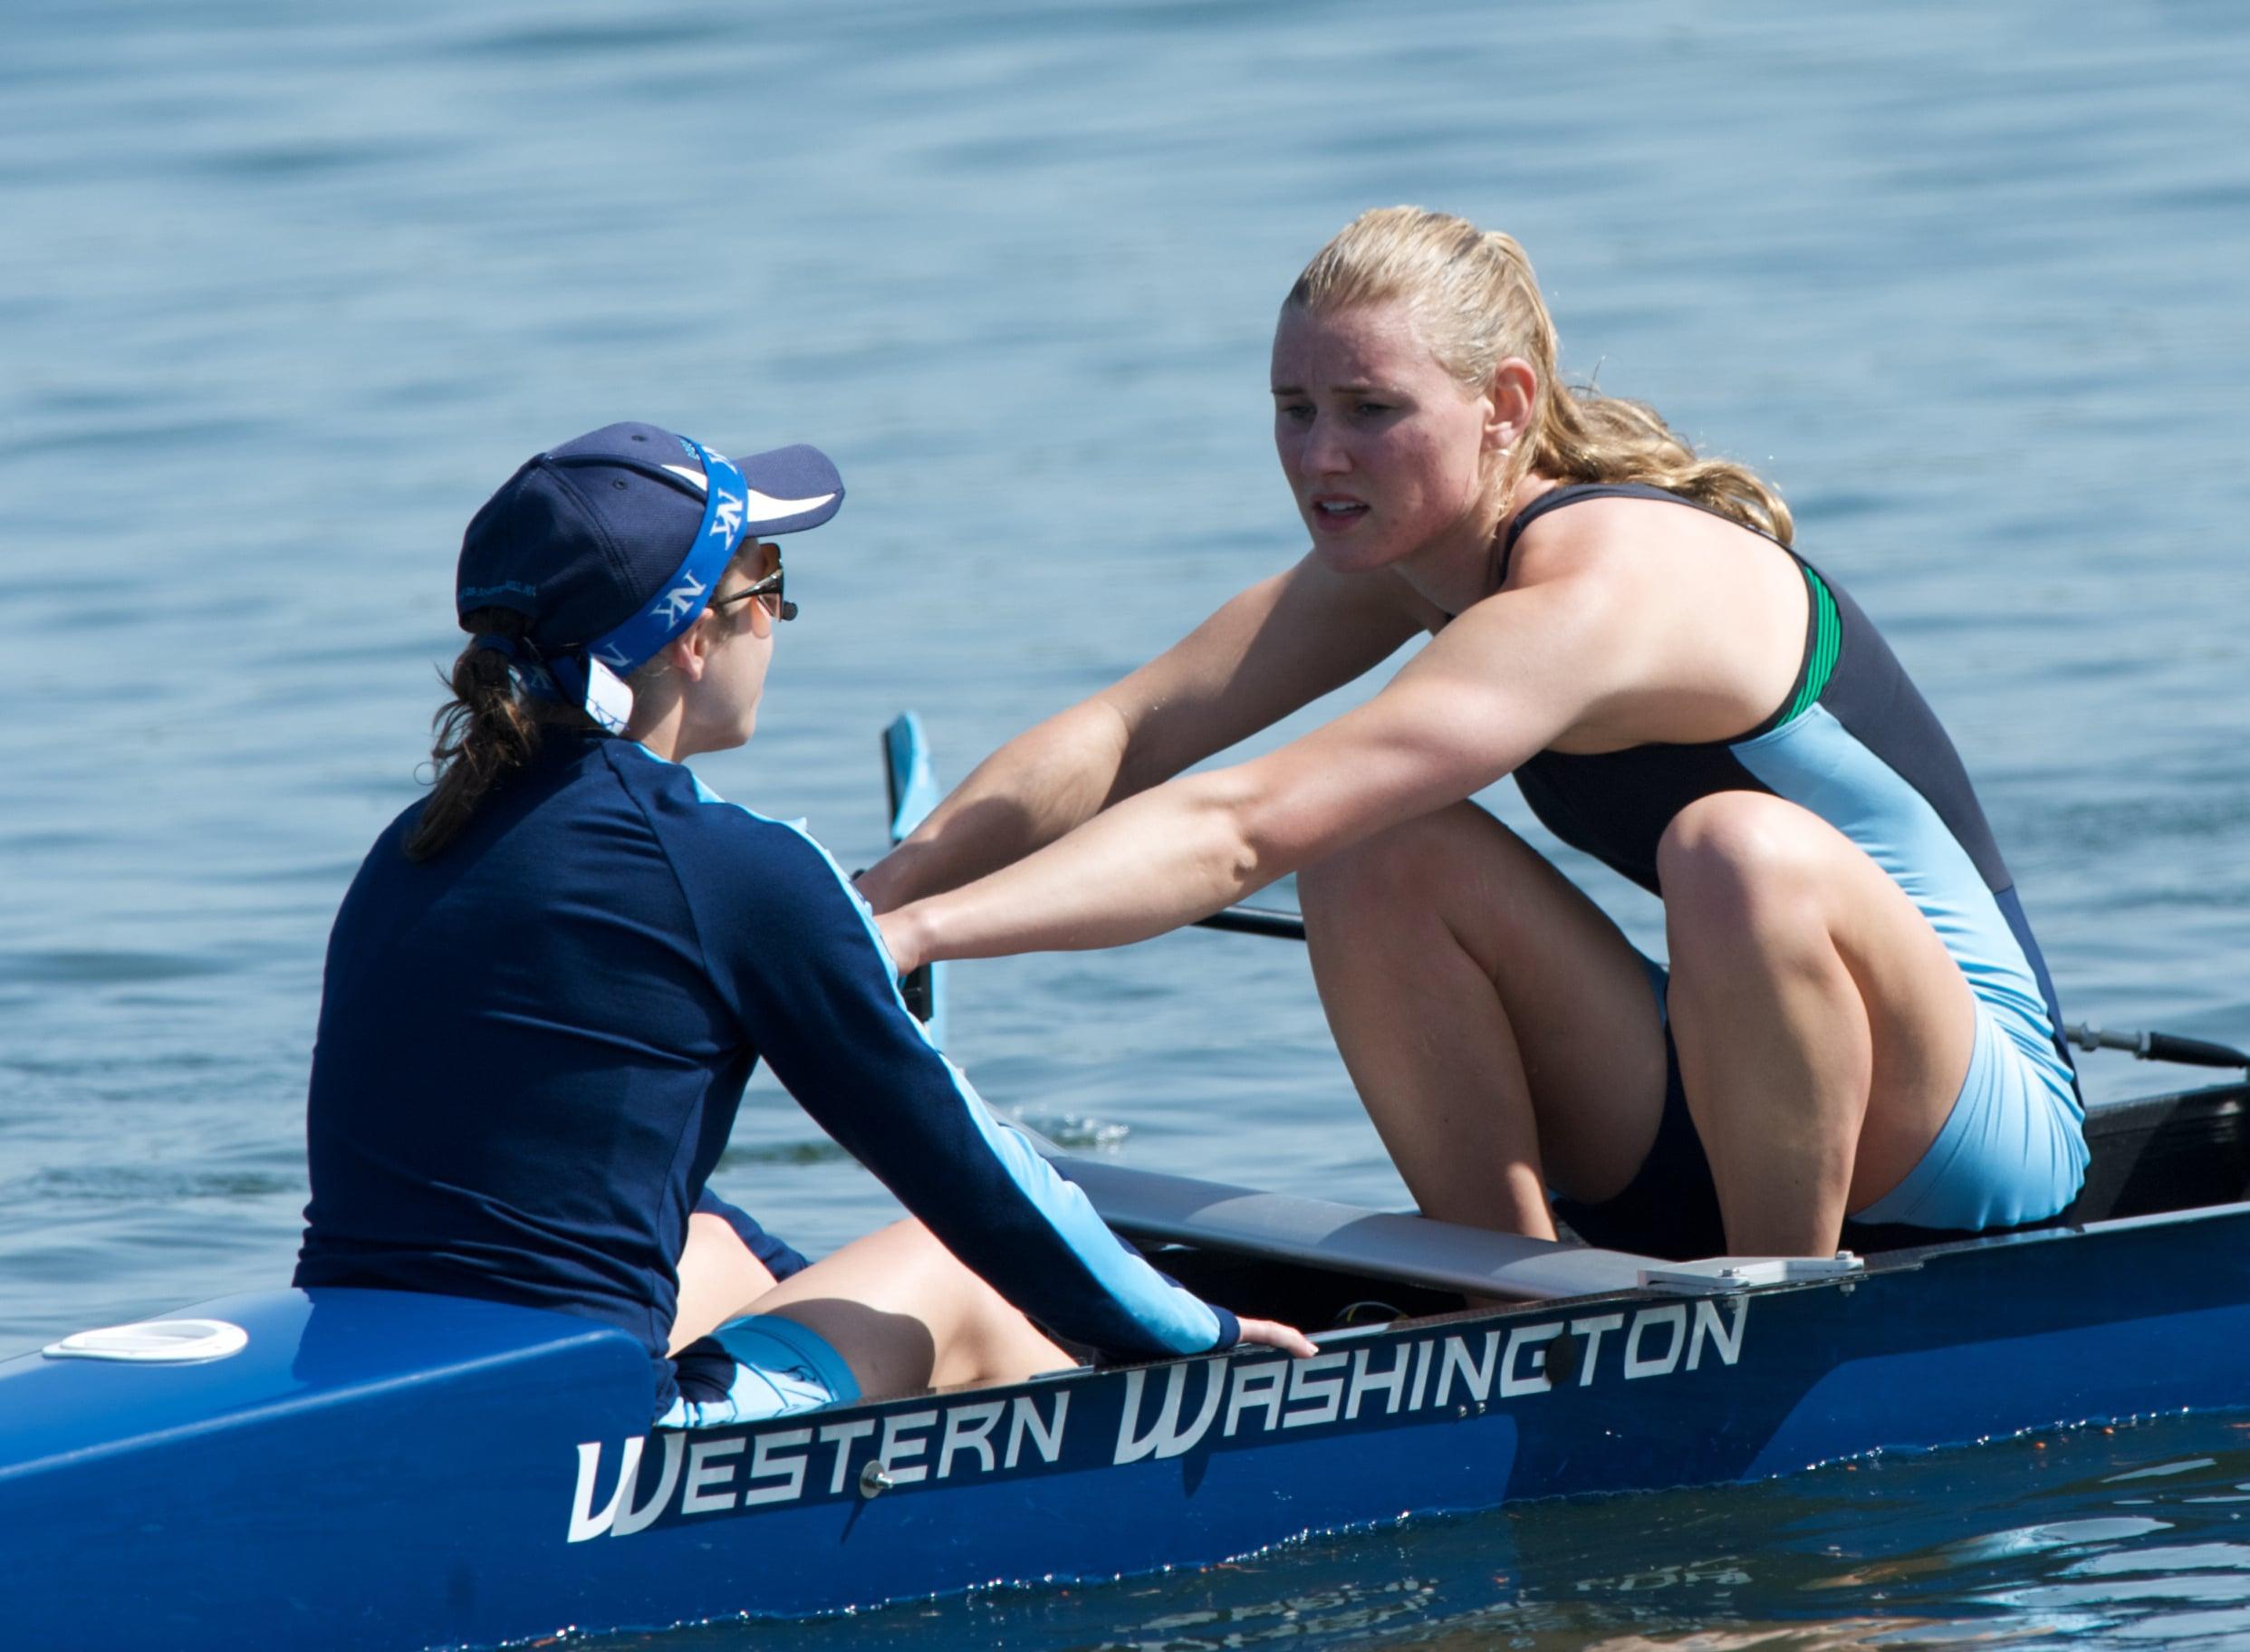 Western Washington crew varsity eight stroke Jean Piette, right, and coxswain Alix Crilly.